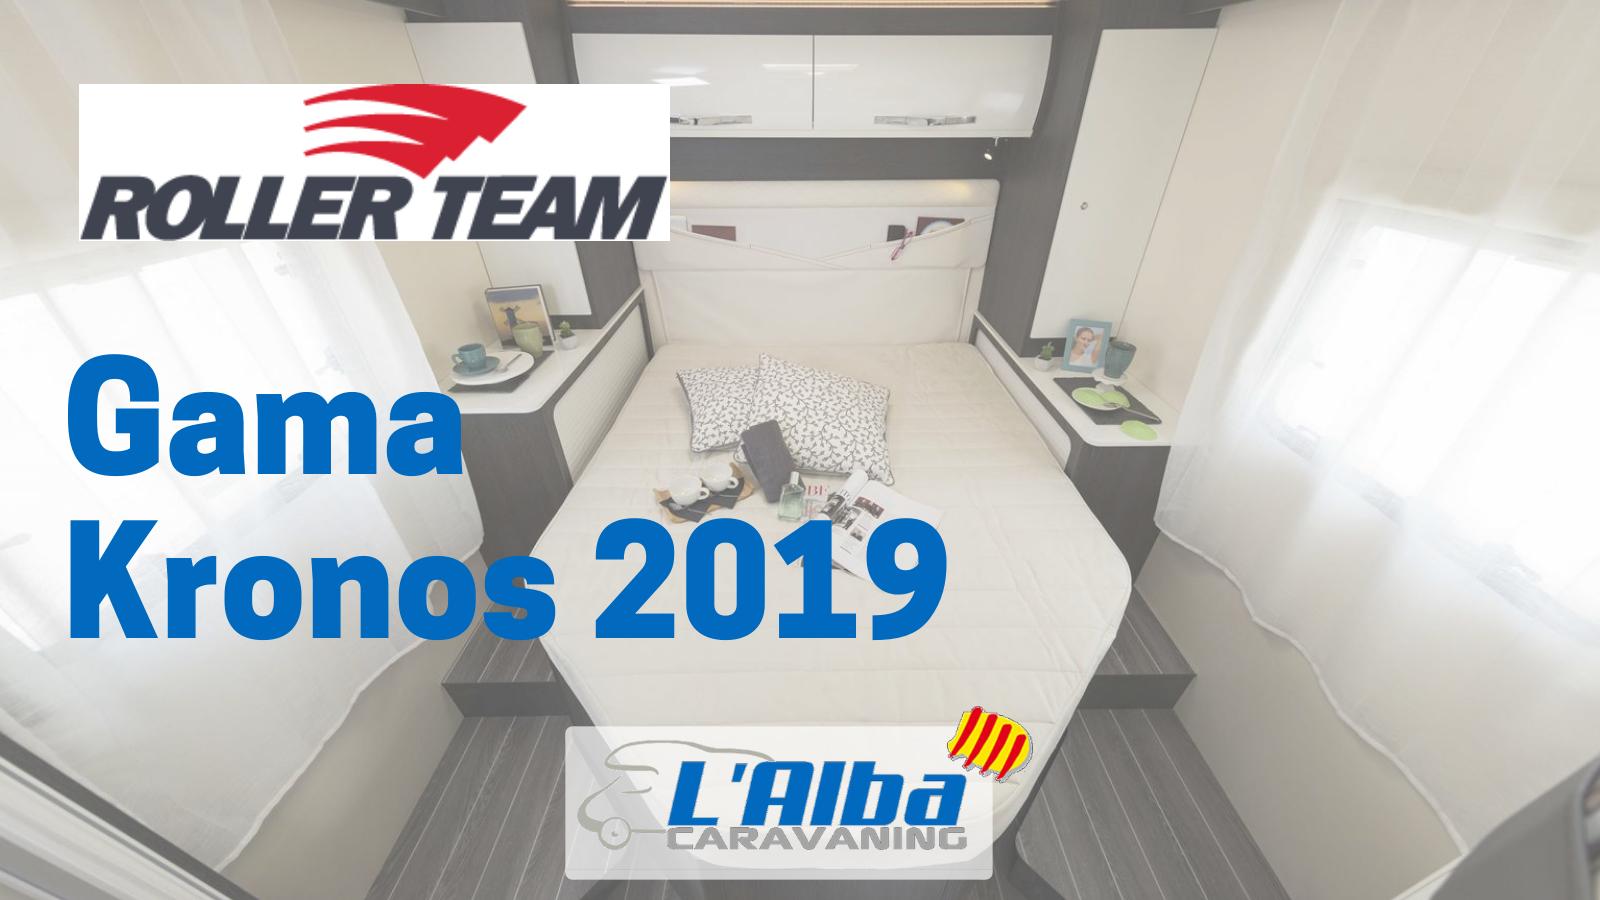 roller team gama kronos 2019 portada